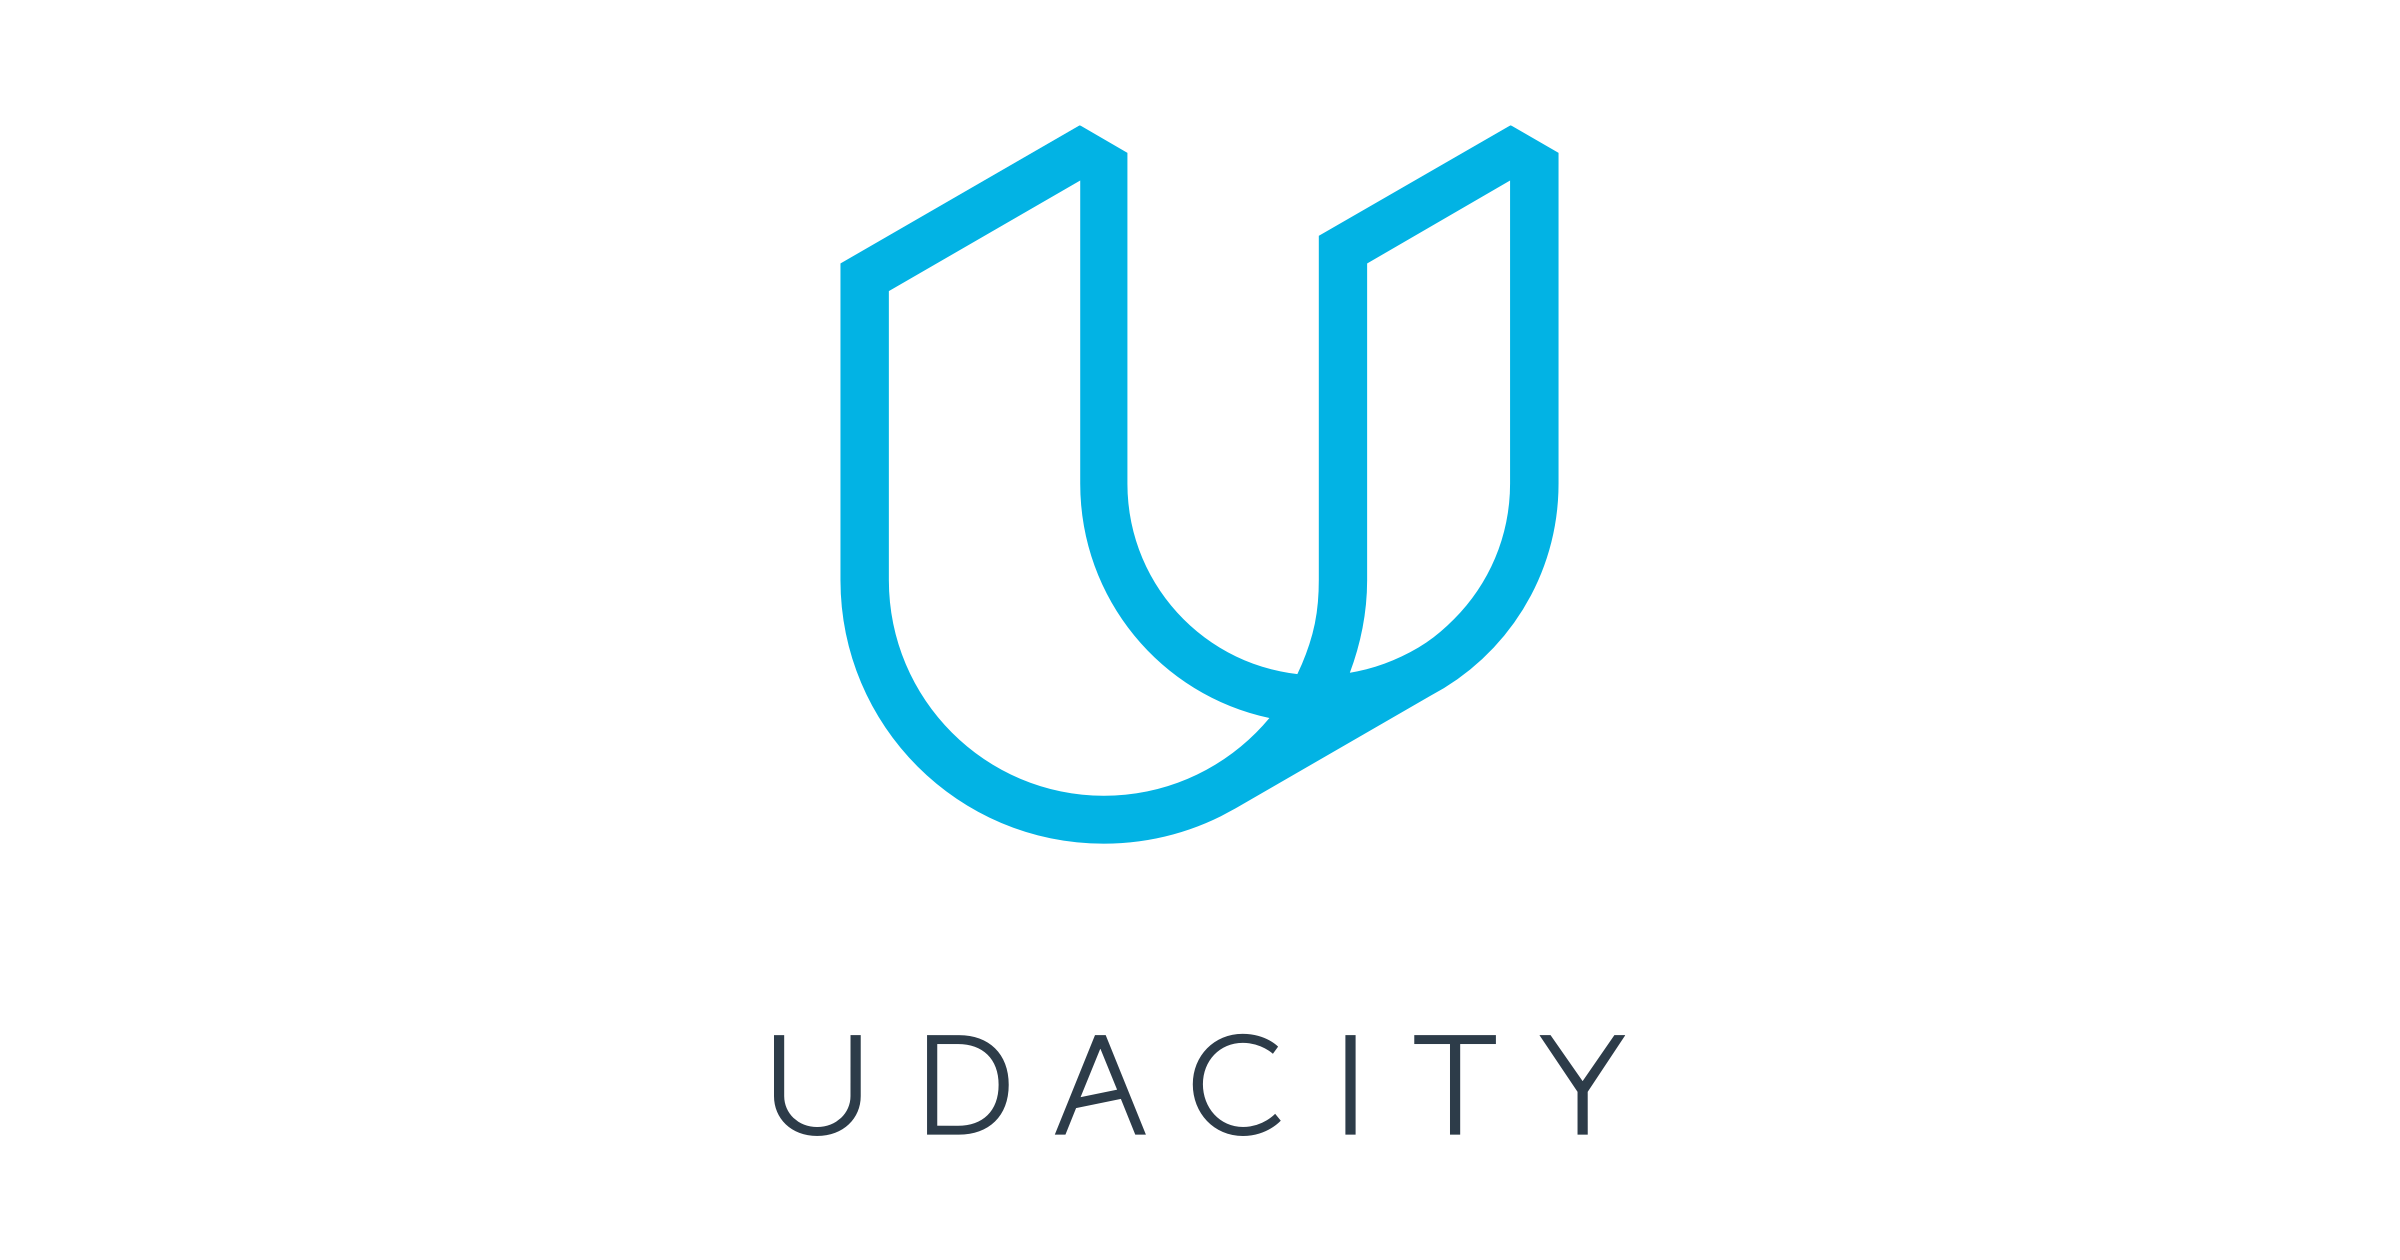 Udacity_logo.png